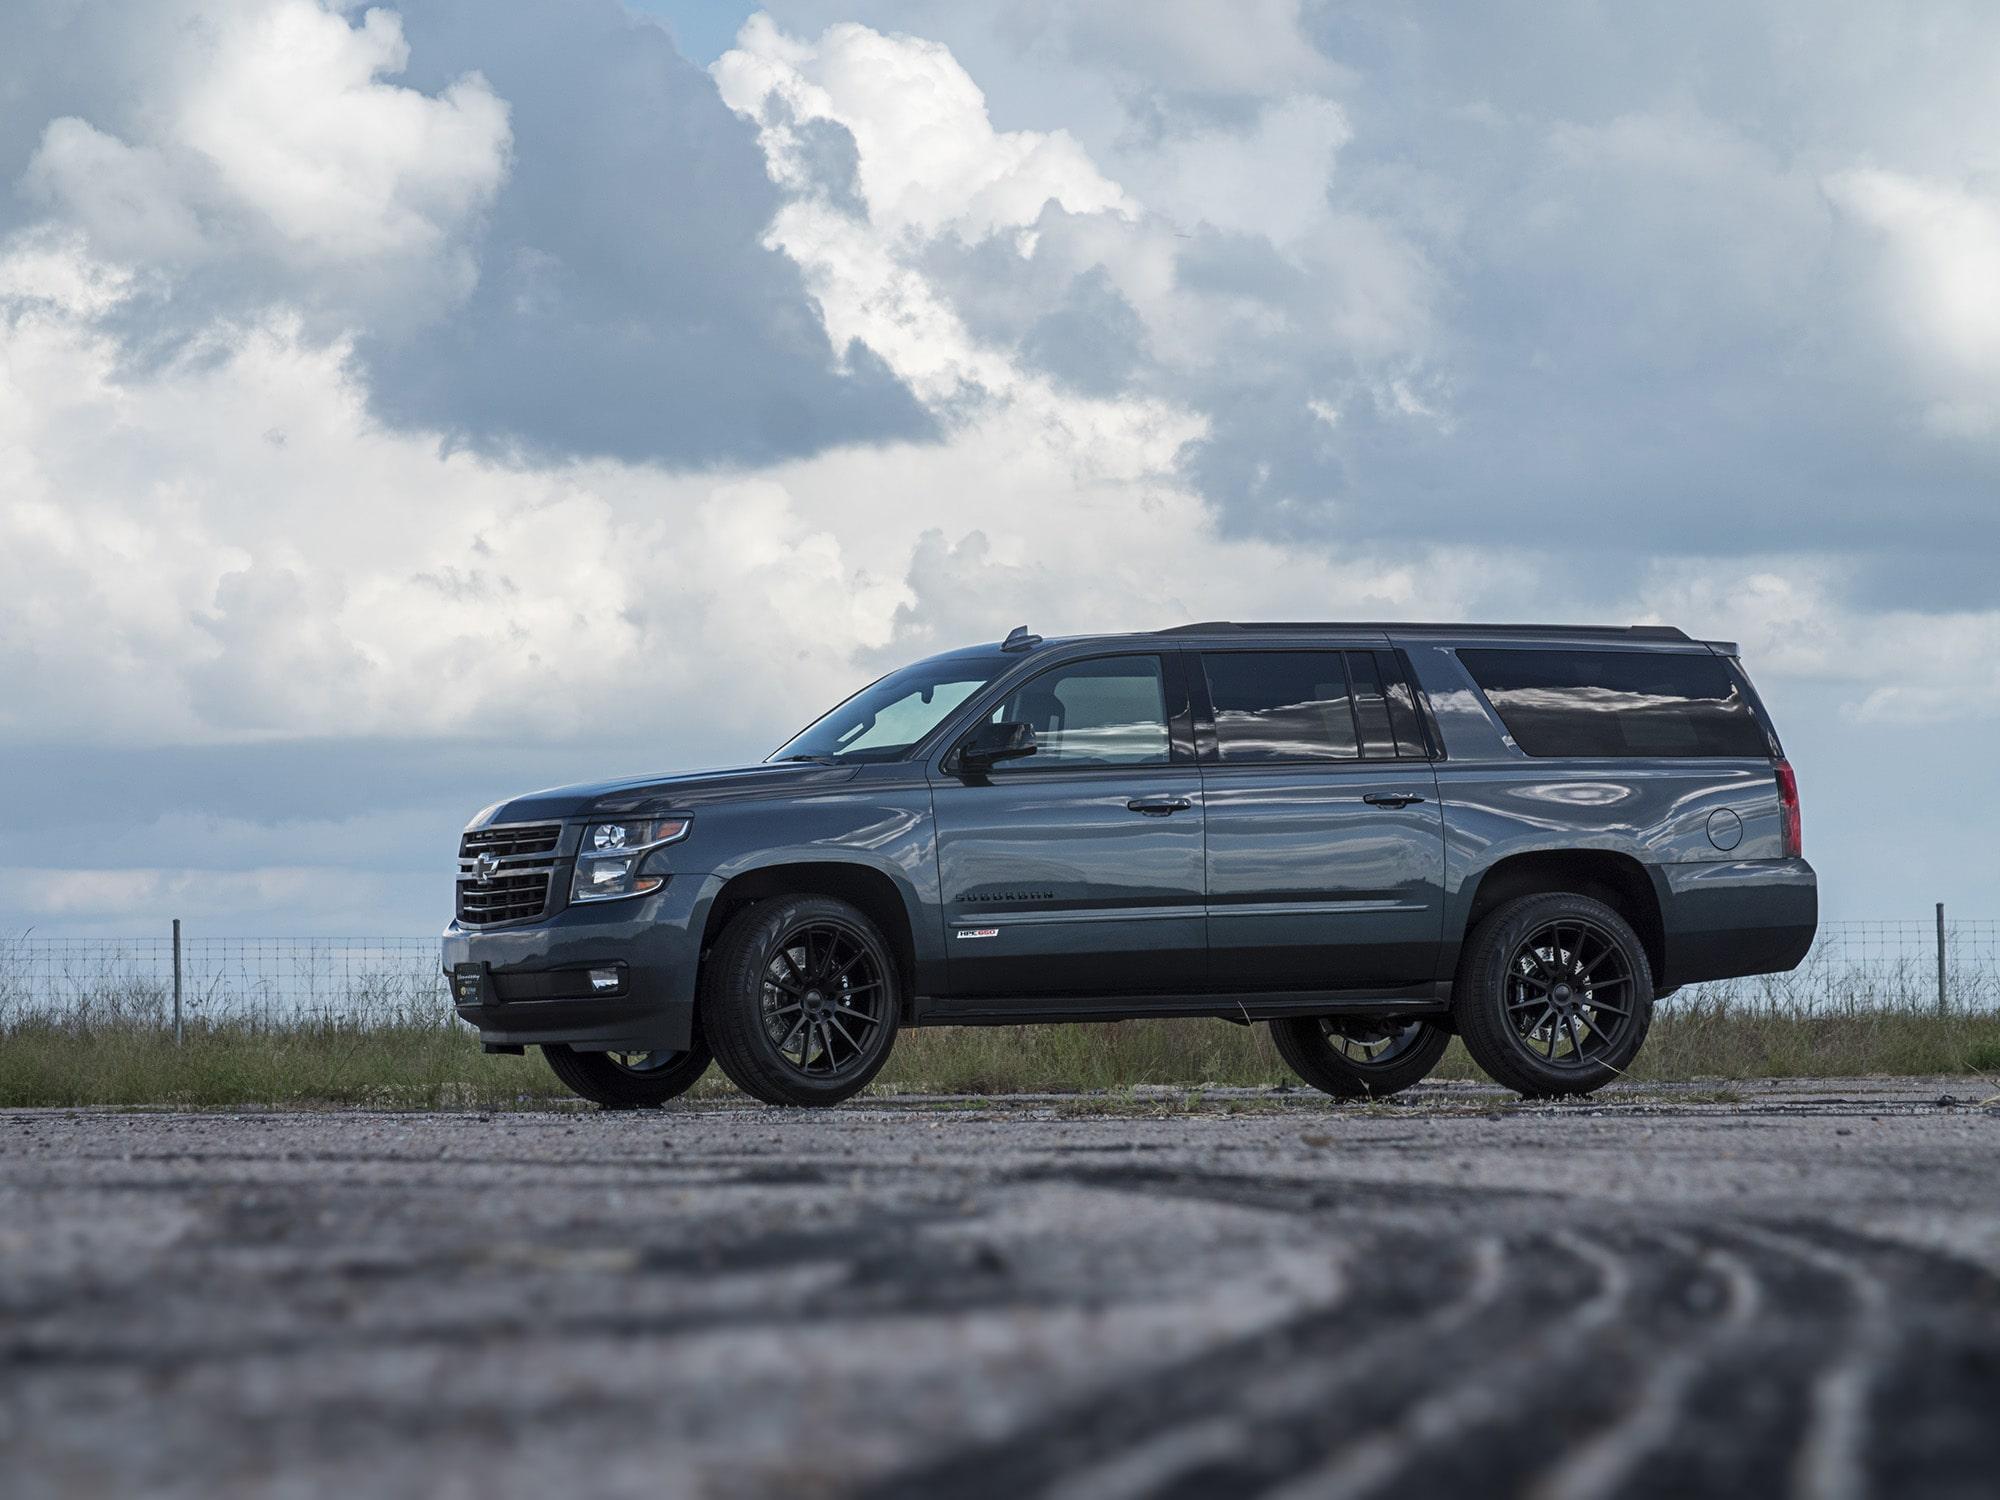 Hennessey HPE650 Chevrolet Suburban RST  2018 HPE650-2018-Chevy-Suburban-Dark-Blue-2-min